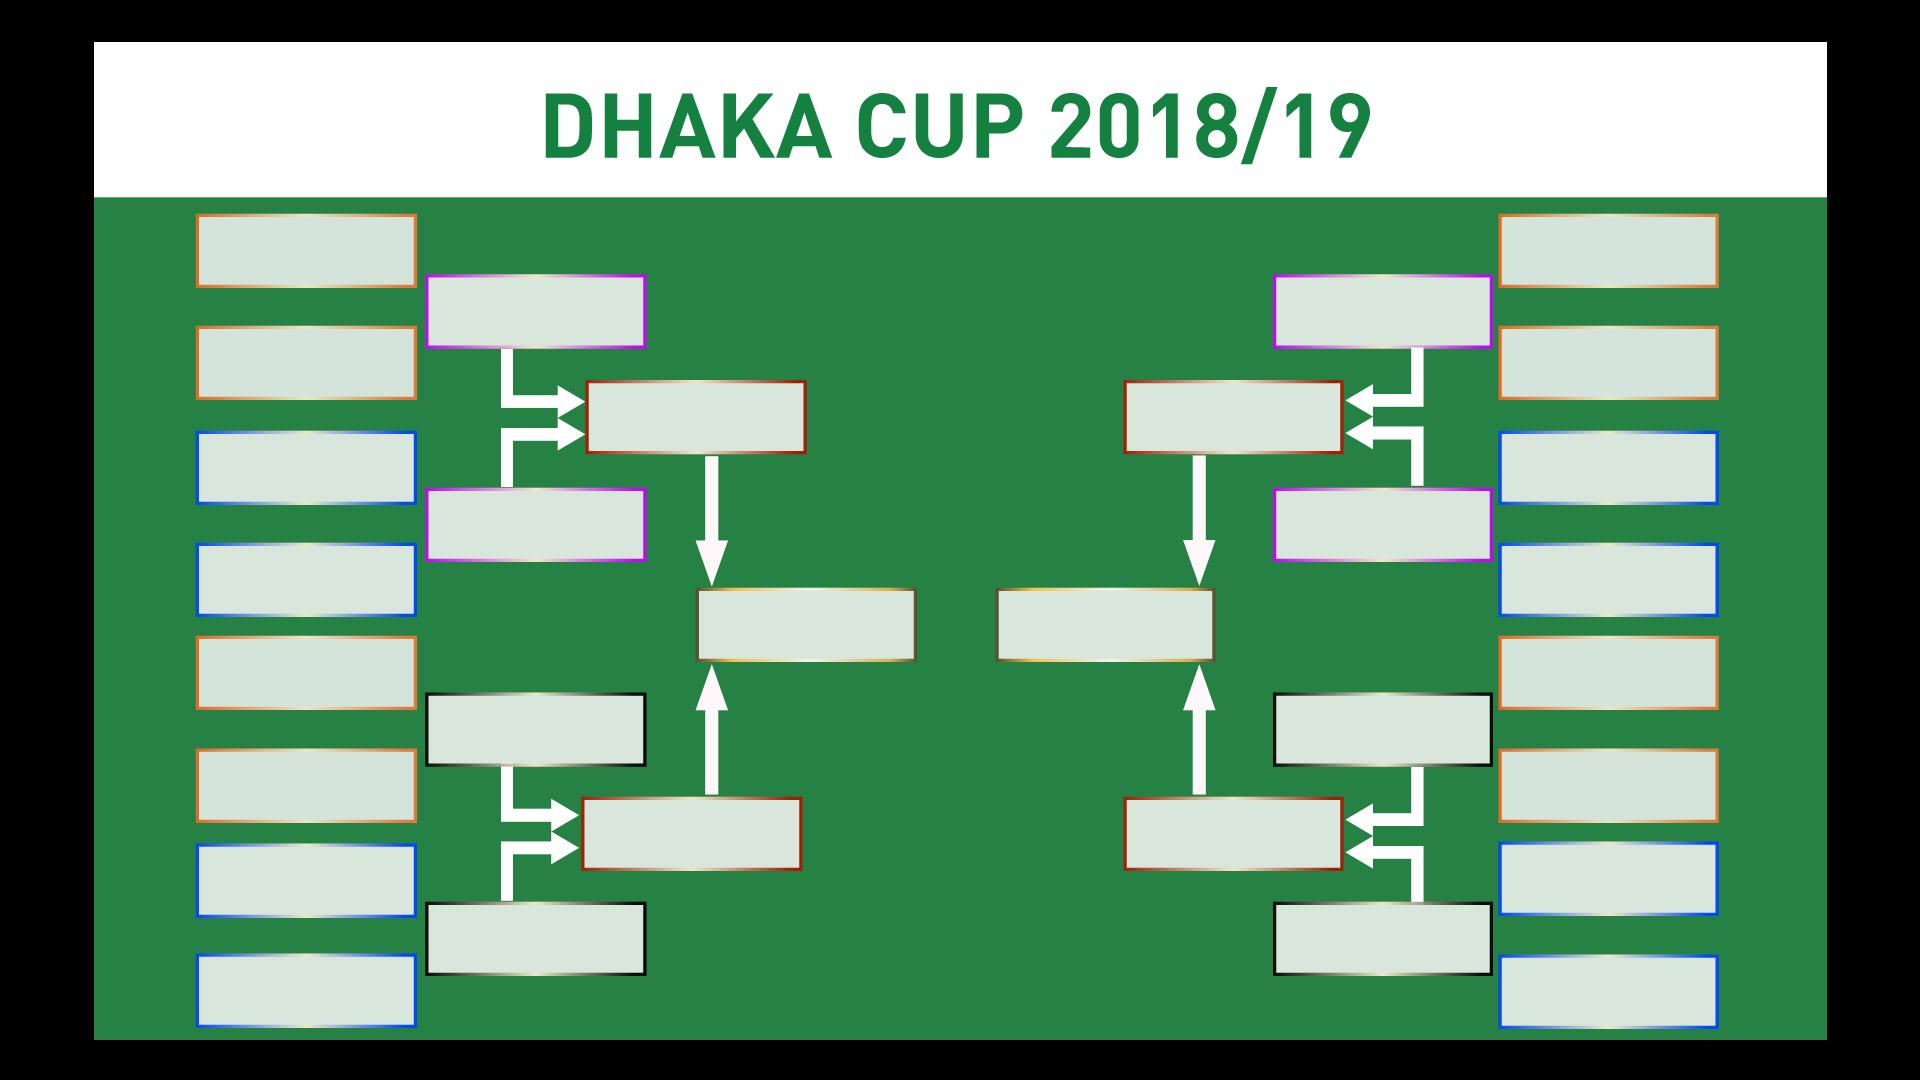 Dhaka Cup T20 - Play Cricket!